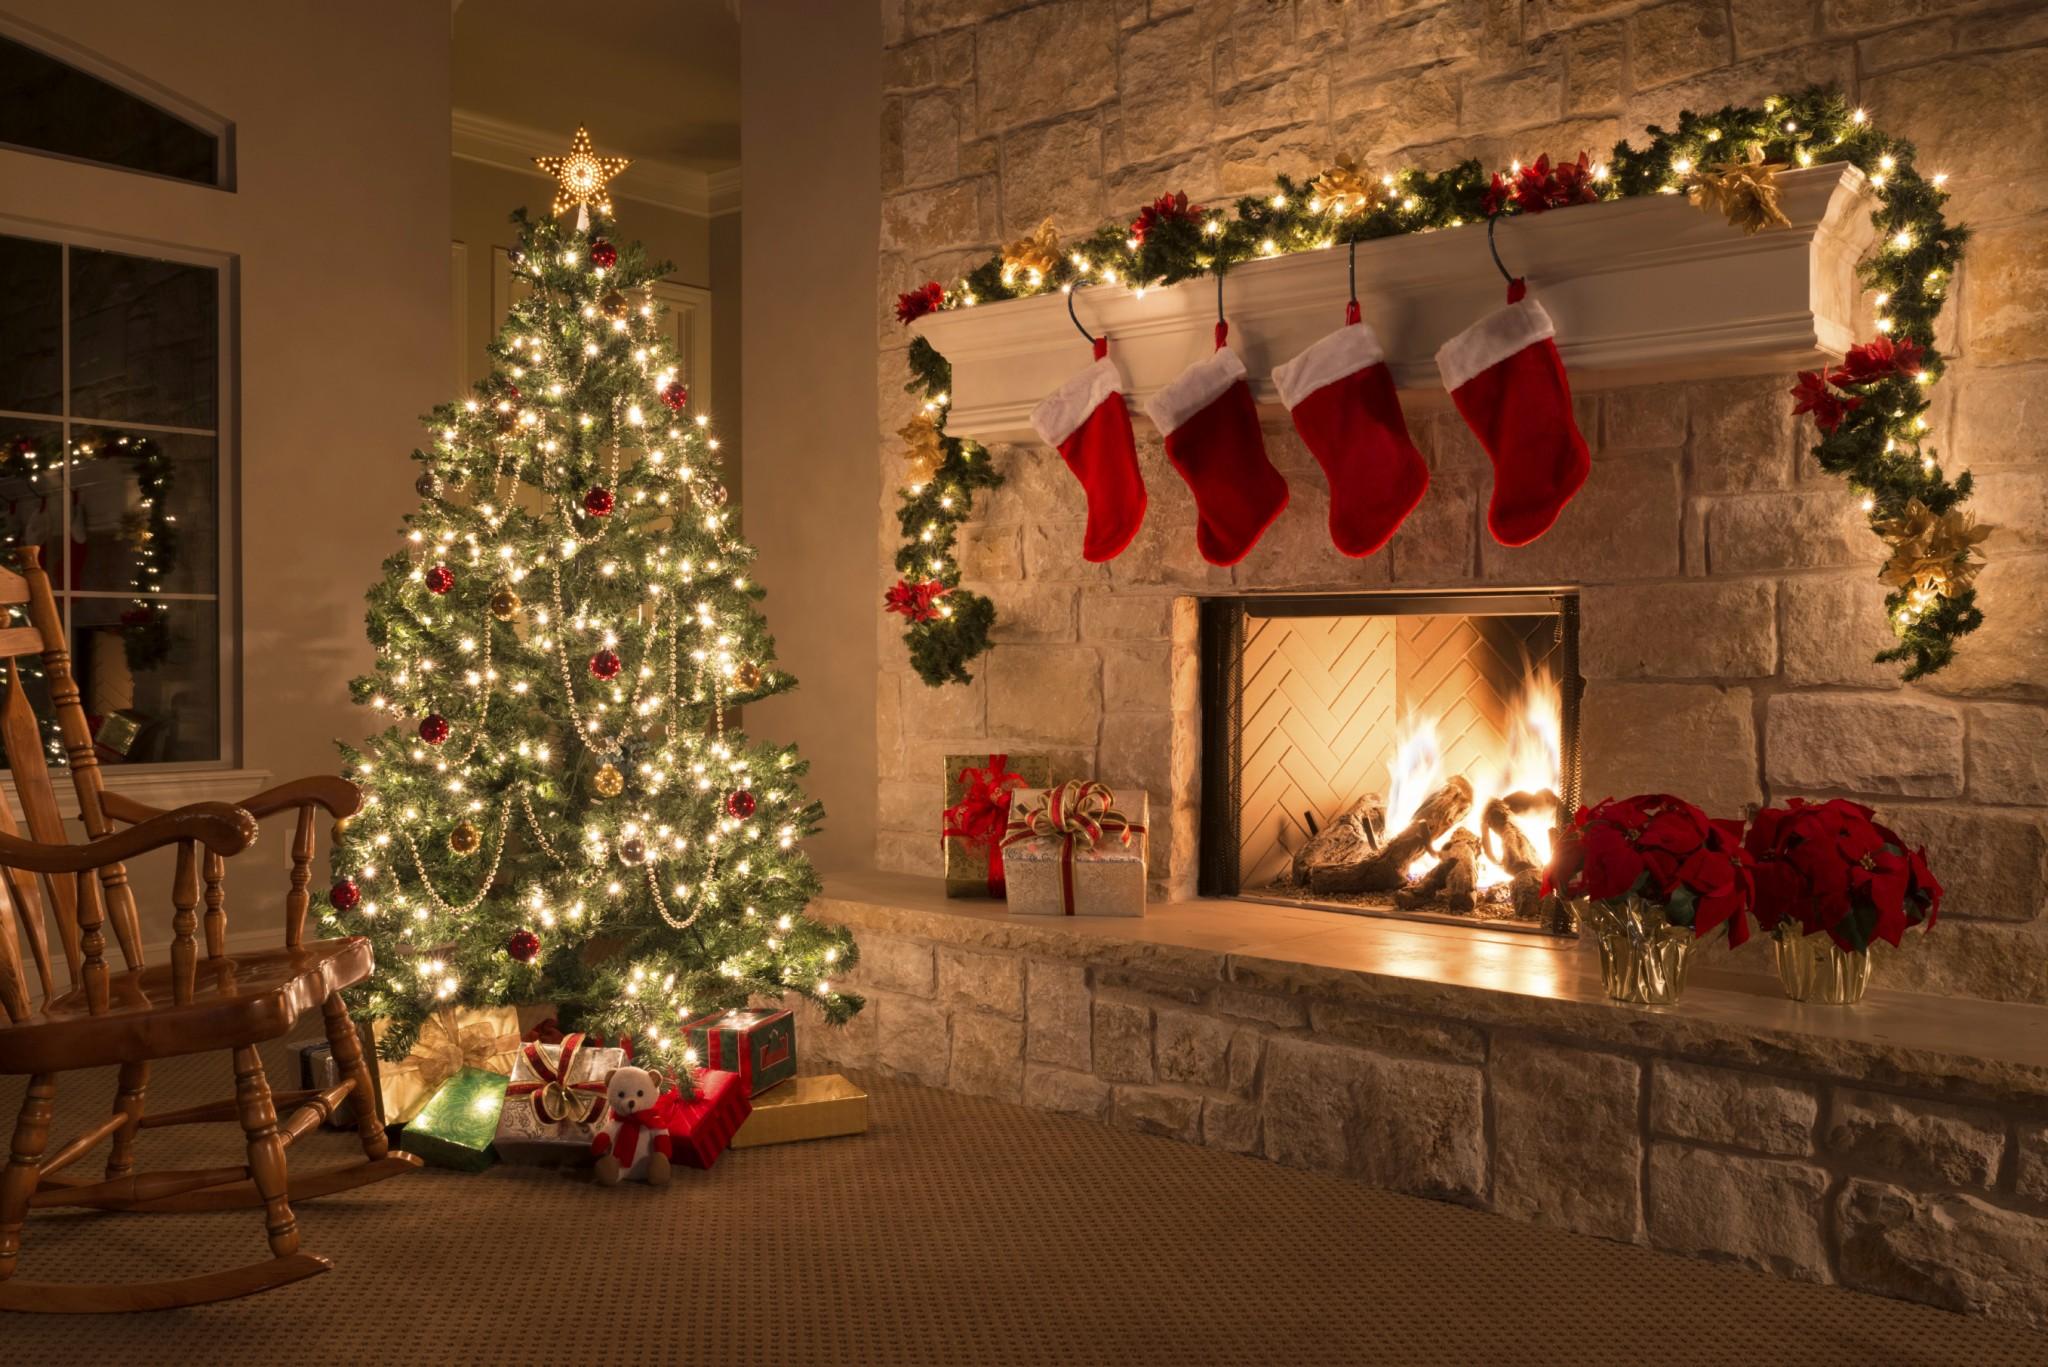 http://www.history.com/topics/christmas